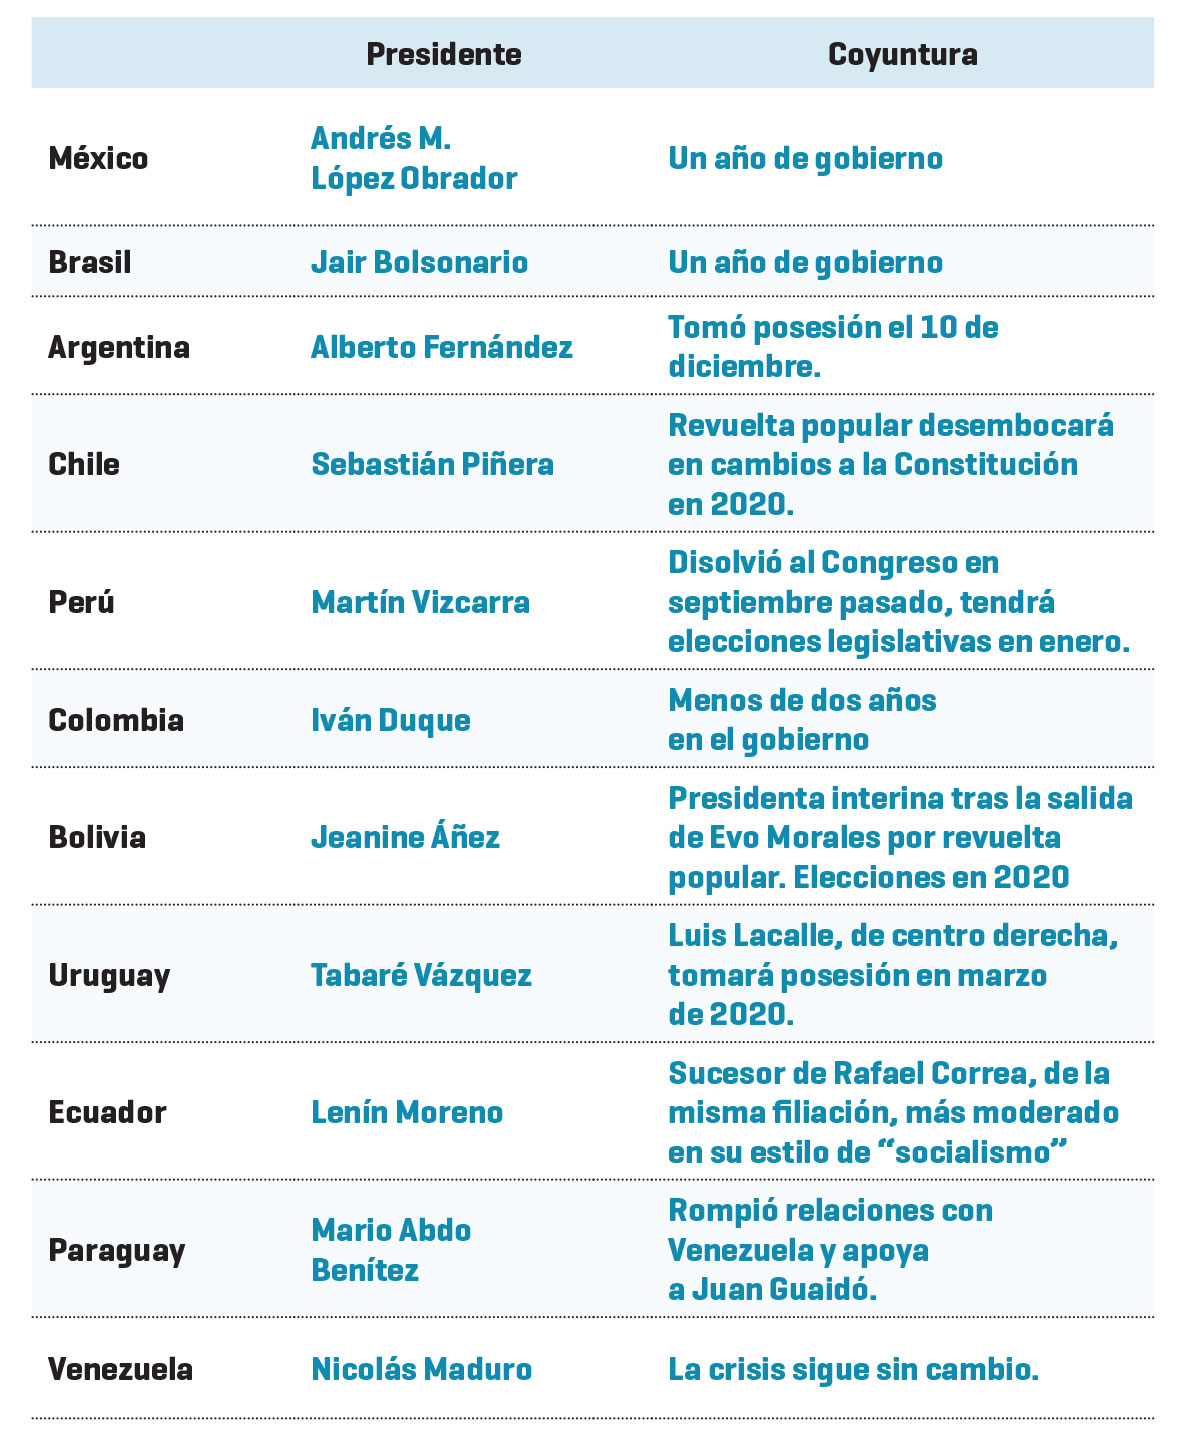 Gráficos: Serafín Allendelagua